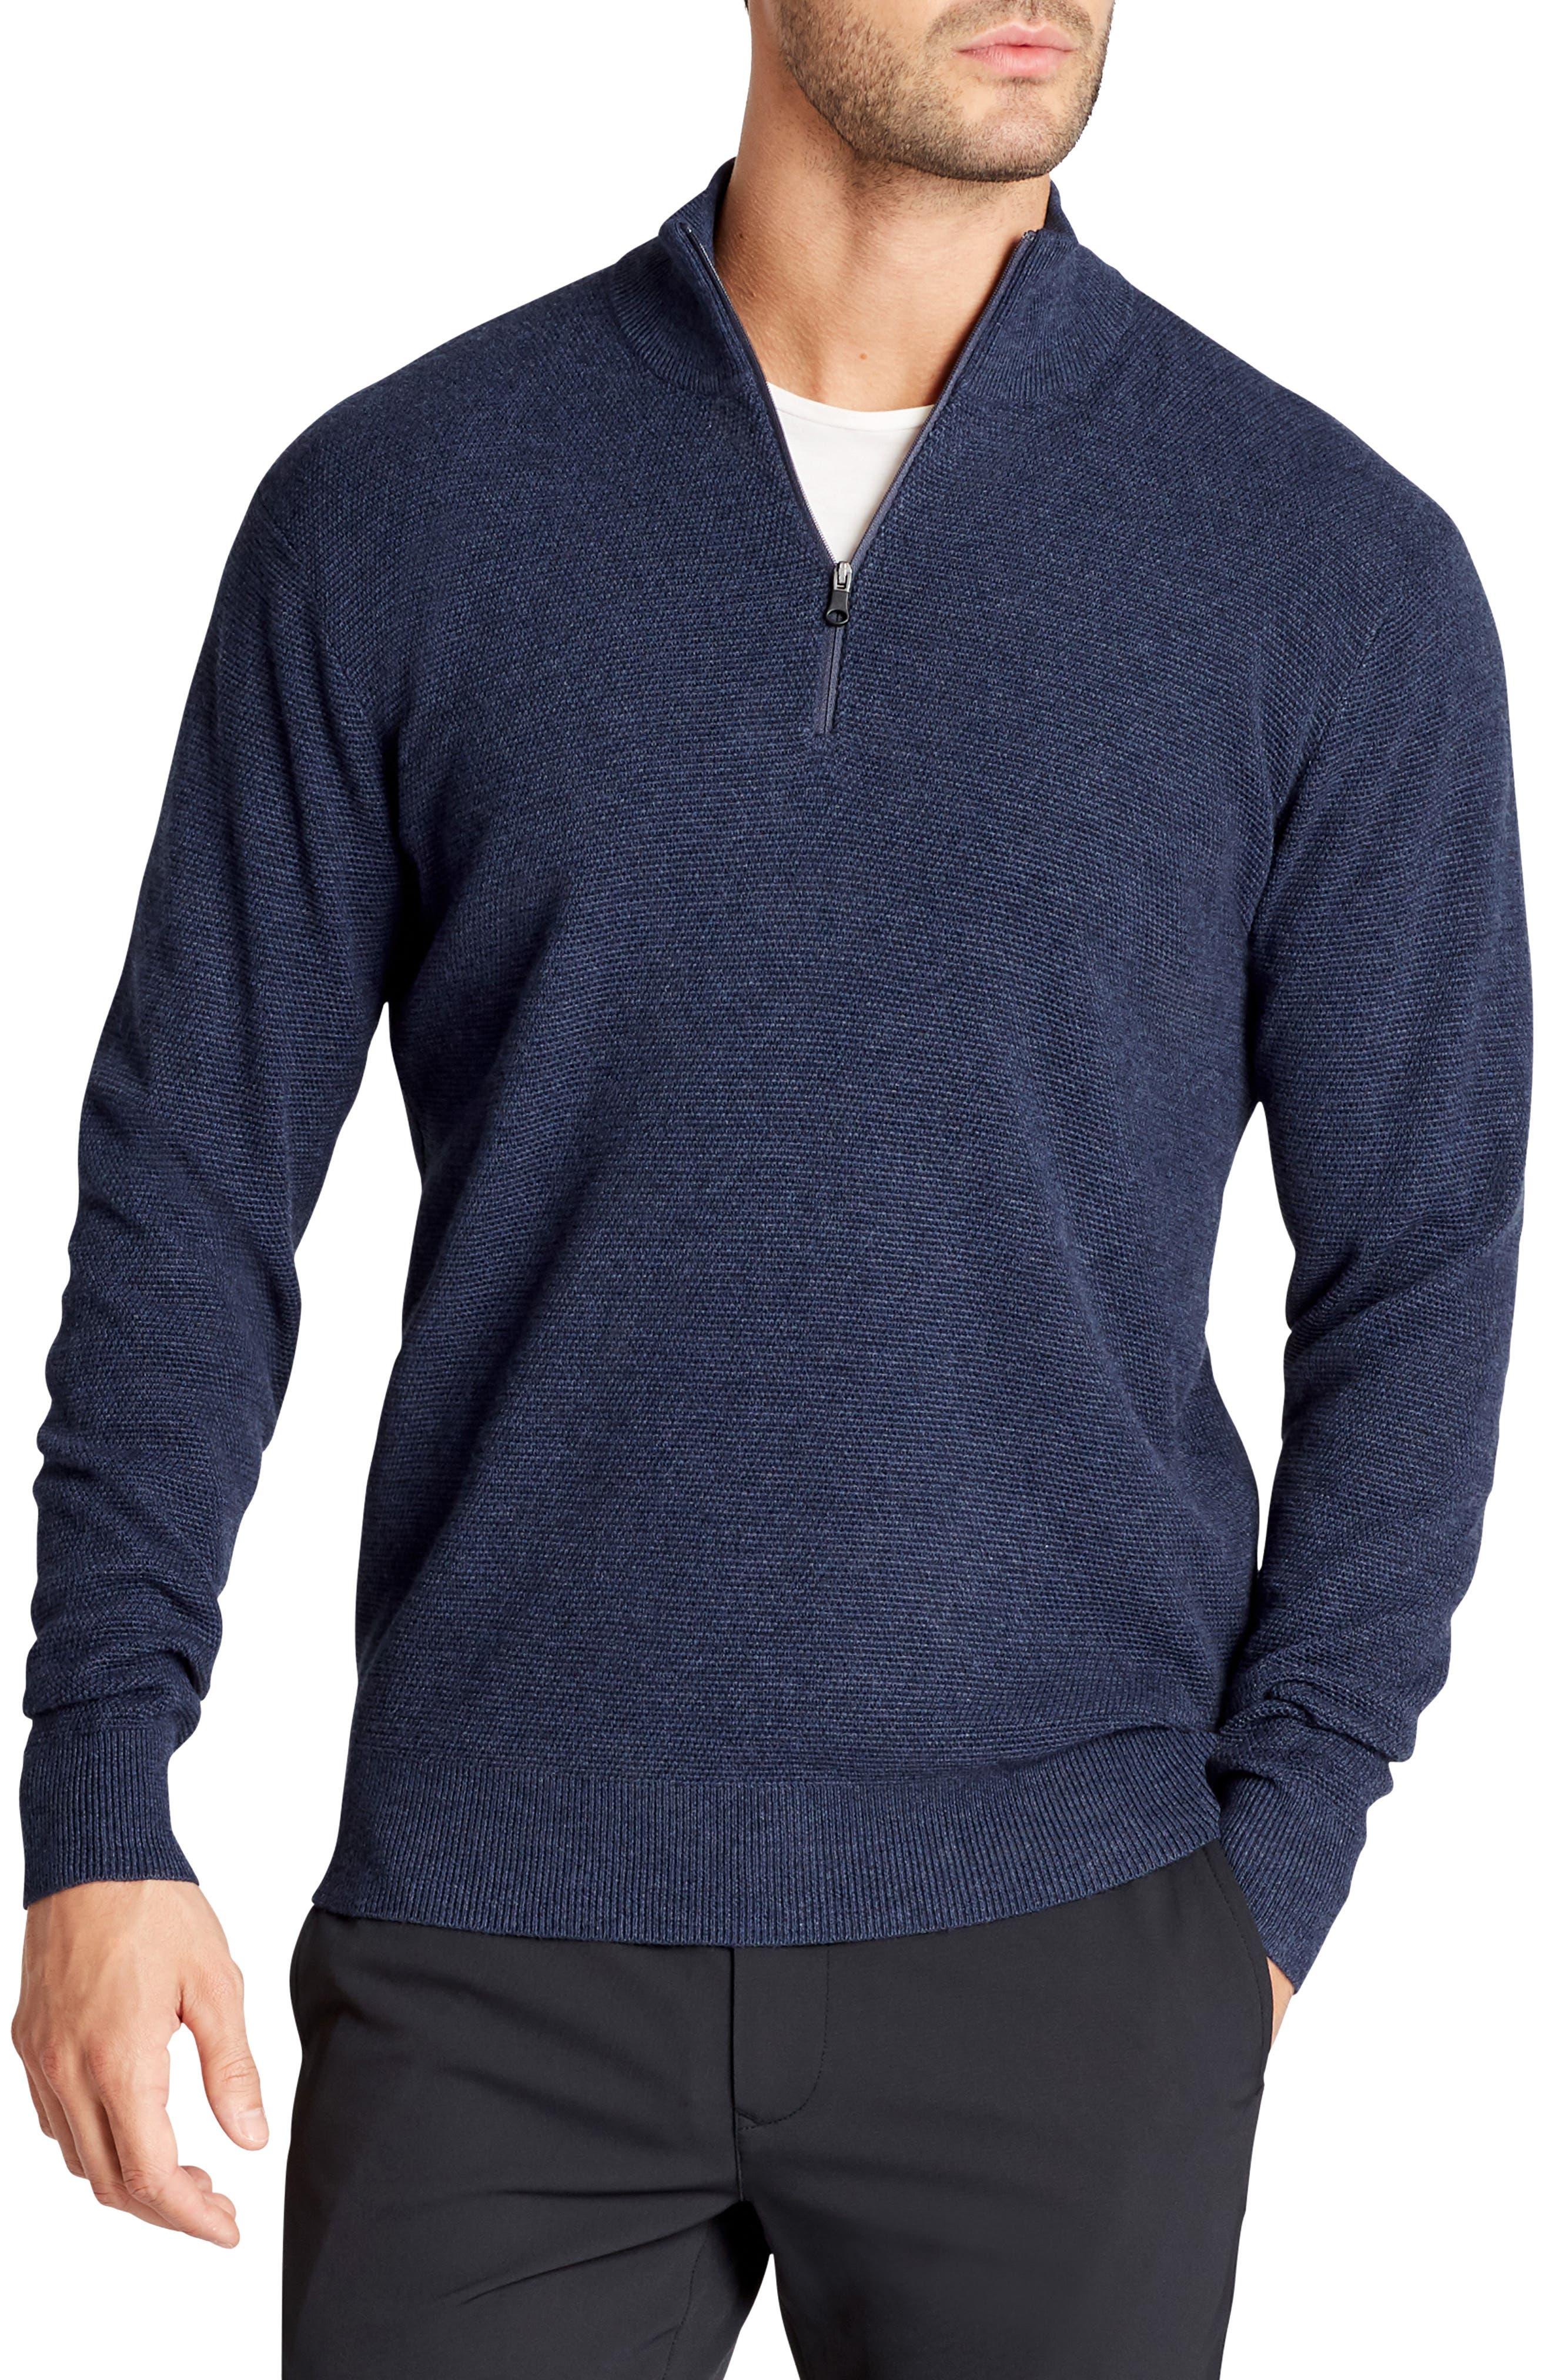 BONOBOS The Knockdown Quarter Zip Pullover, Main, color, HEATHER NAVY